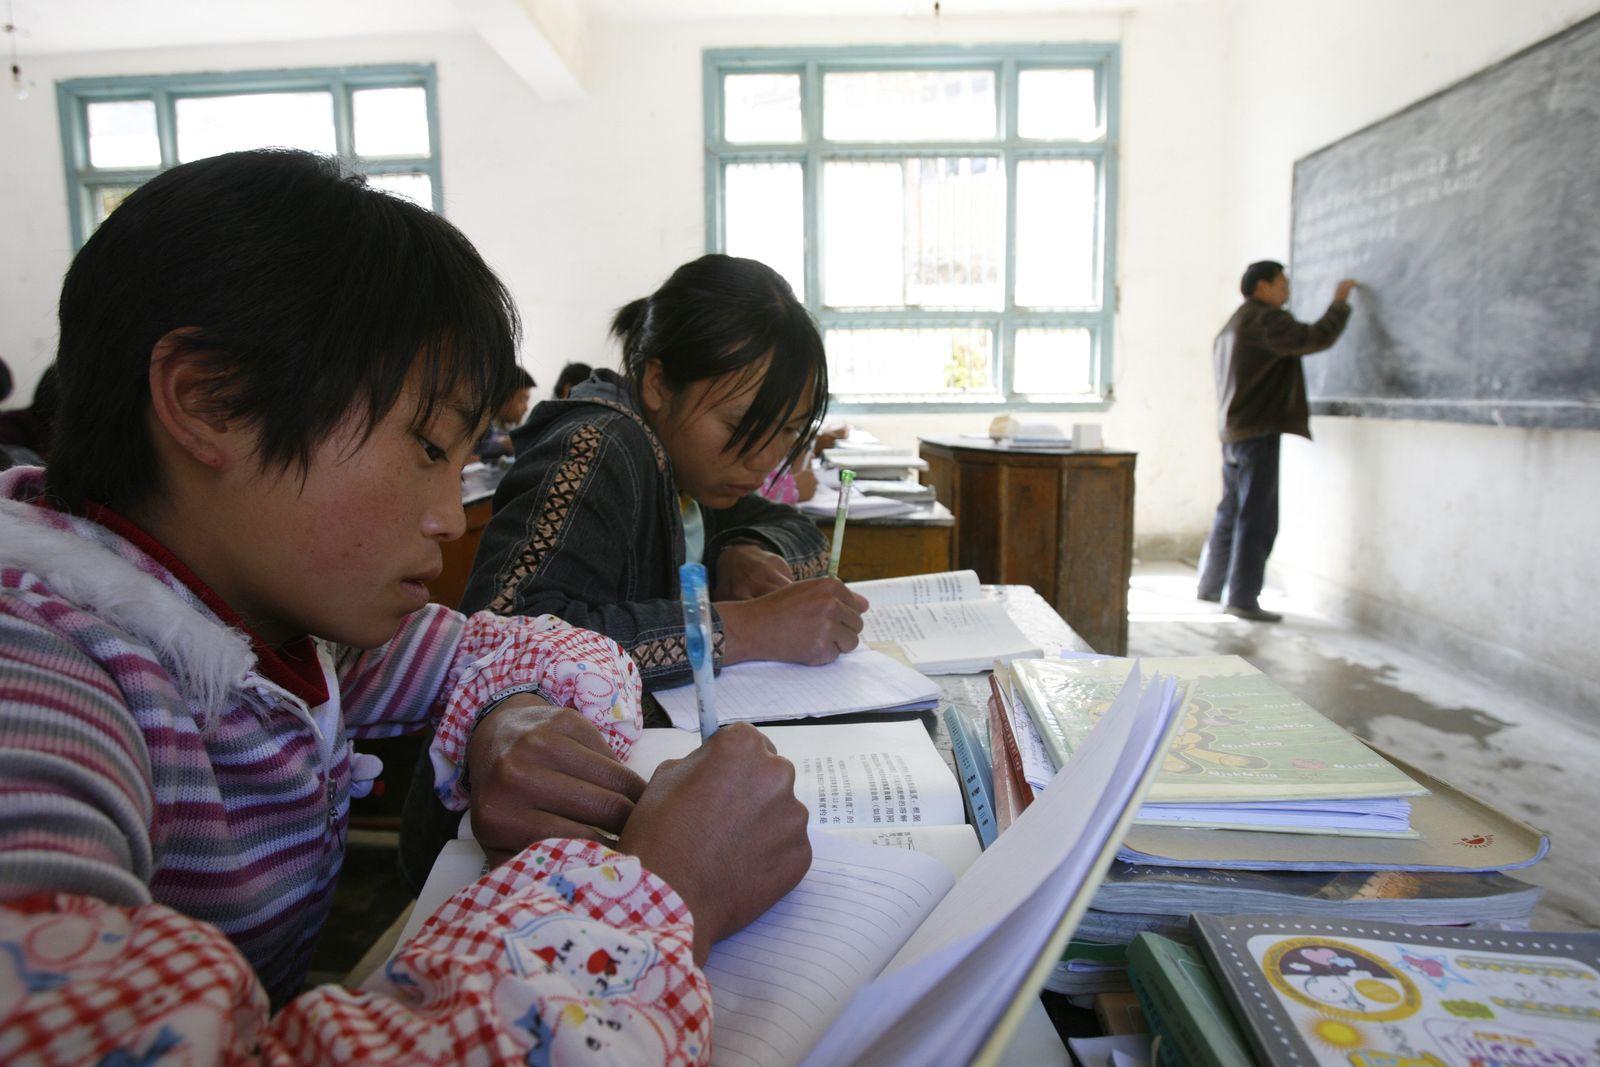 China / Schüler / Schule / Symbolbild